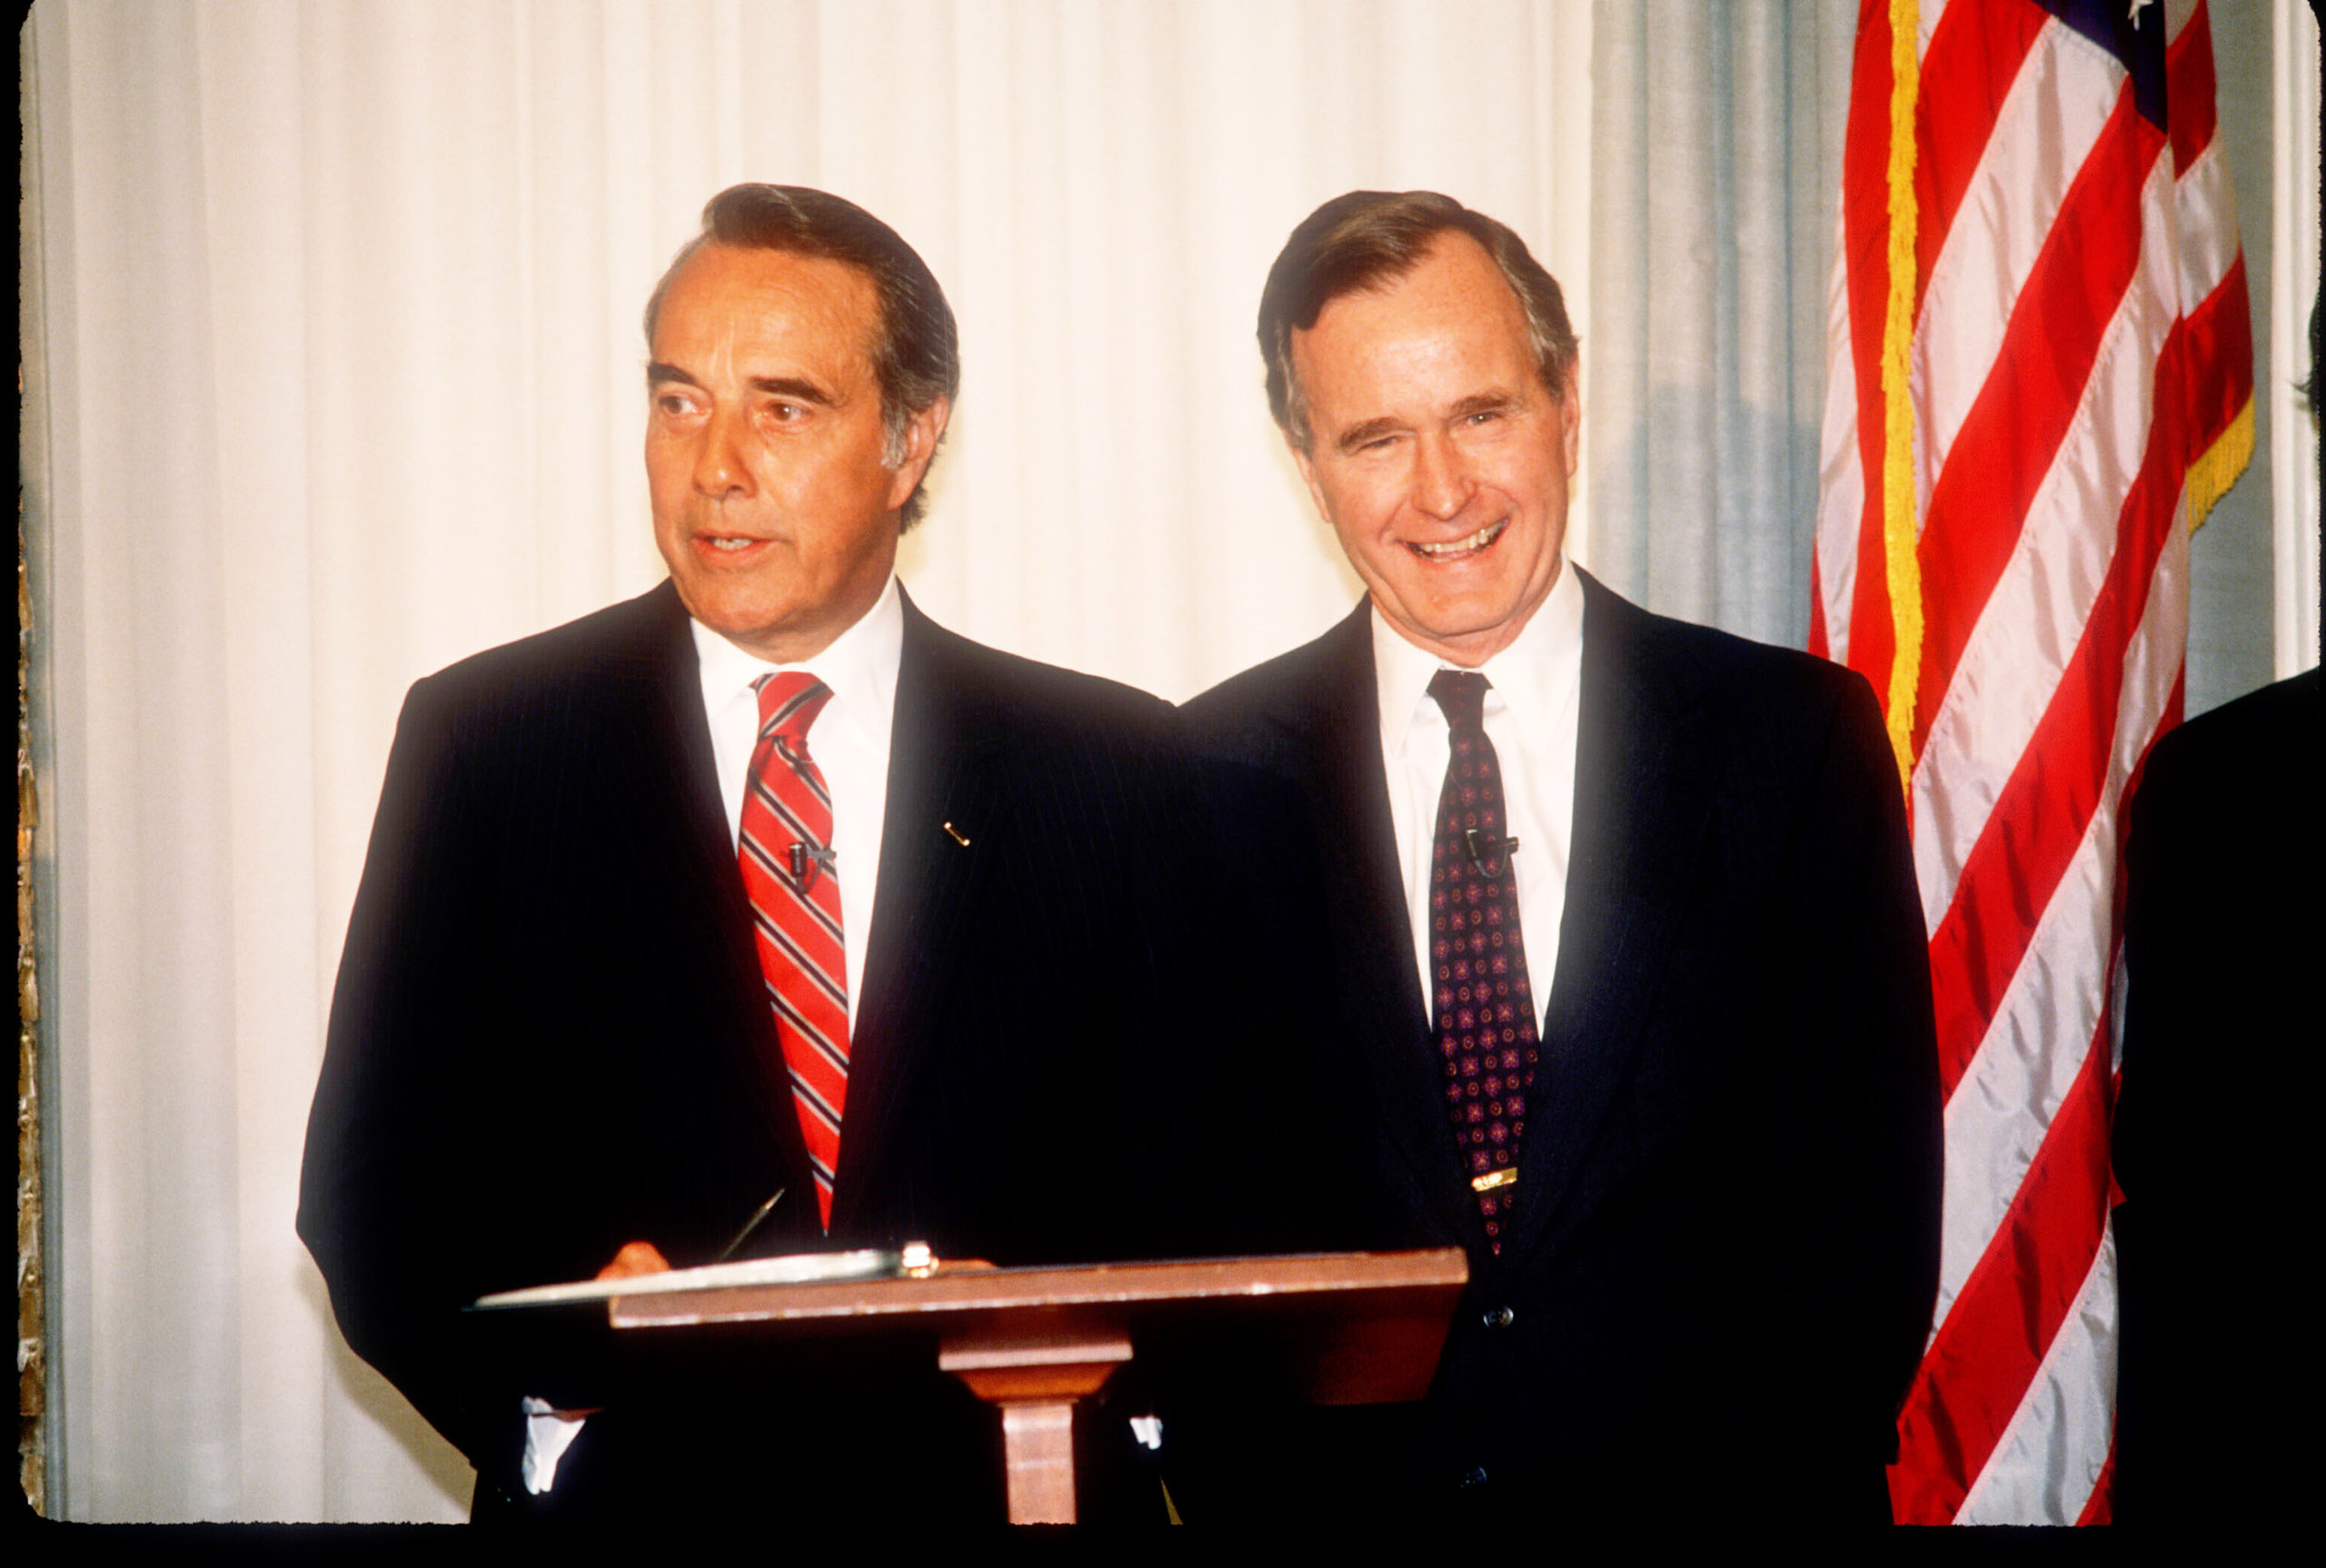 George Herbert Walker Bush stands with Bob Dole in Washington, D.C., on April 15, 1988.